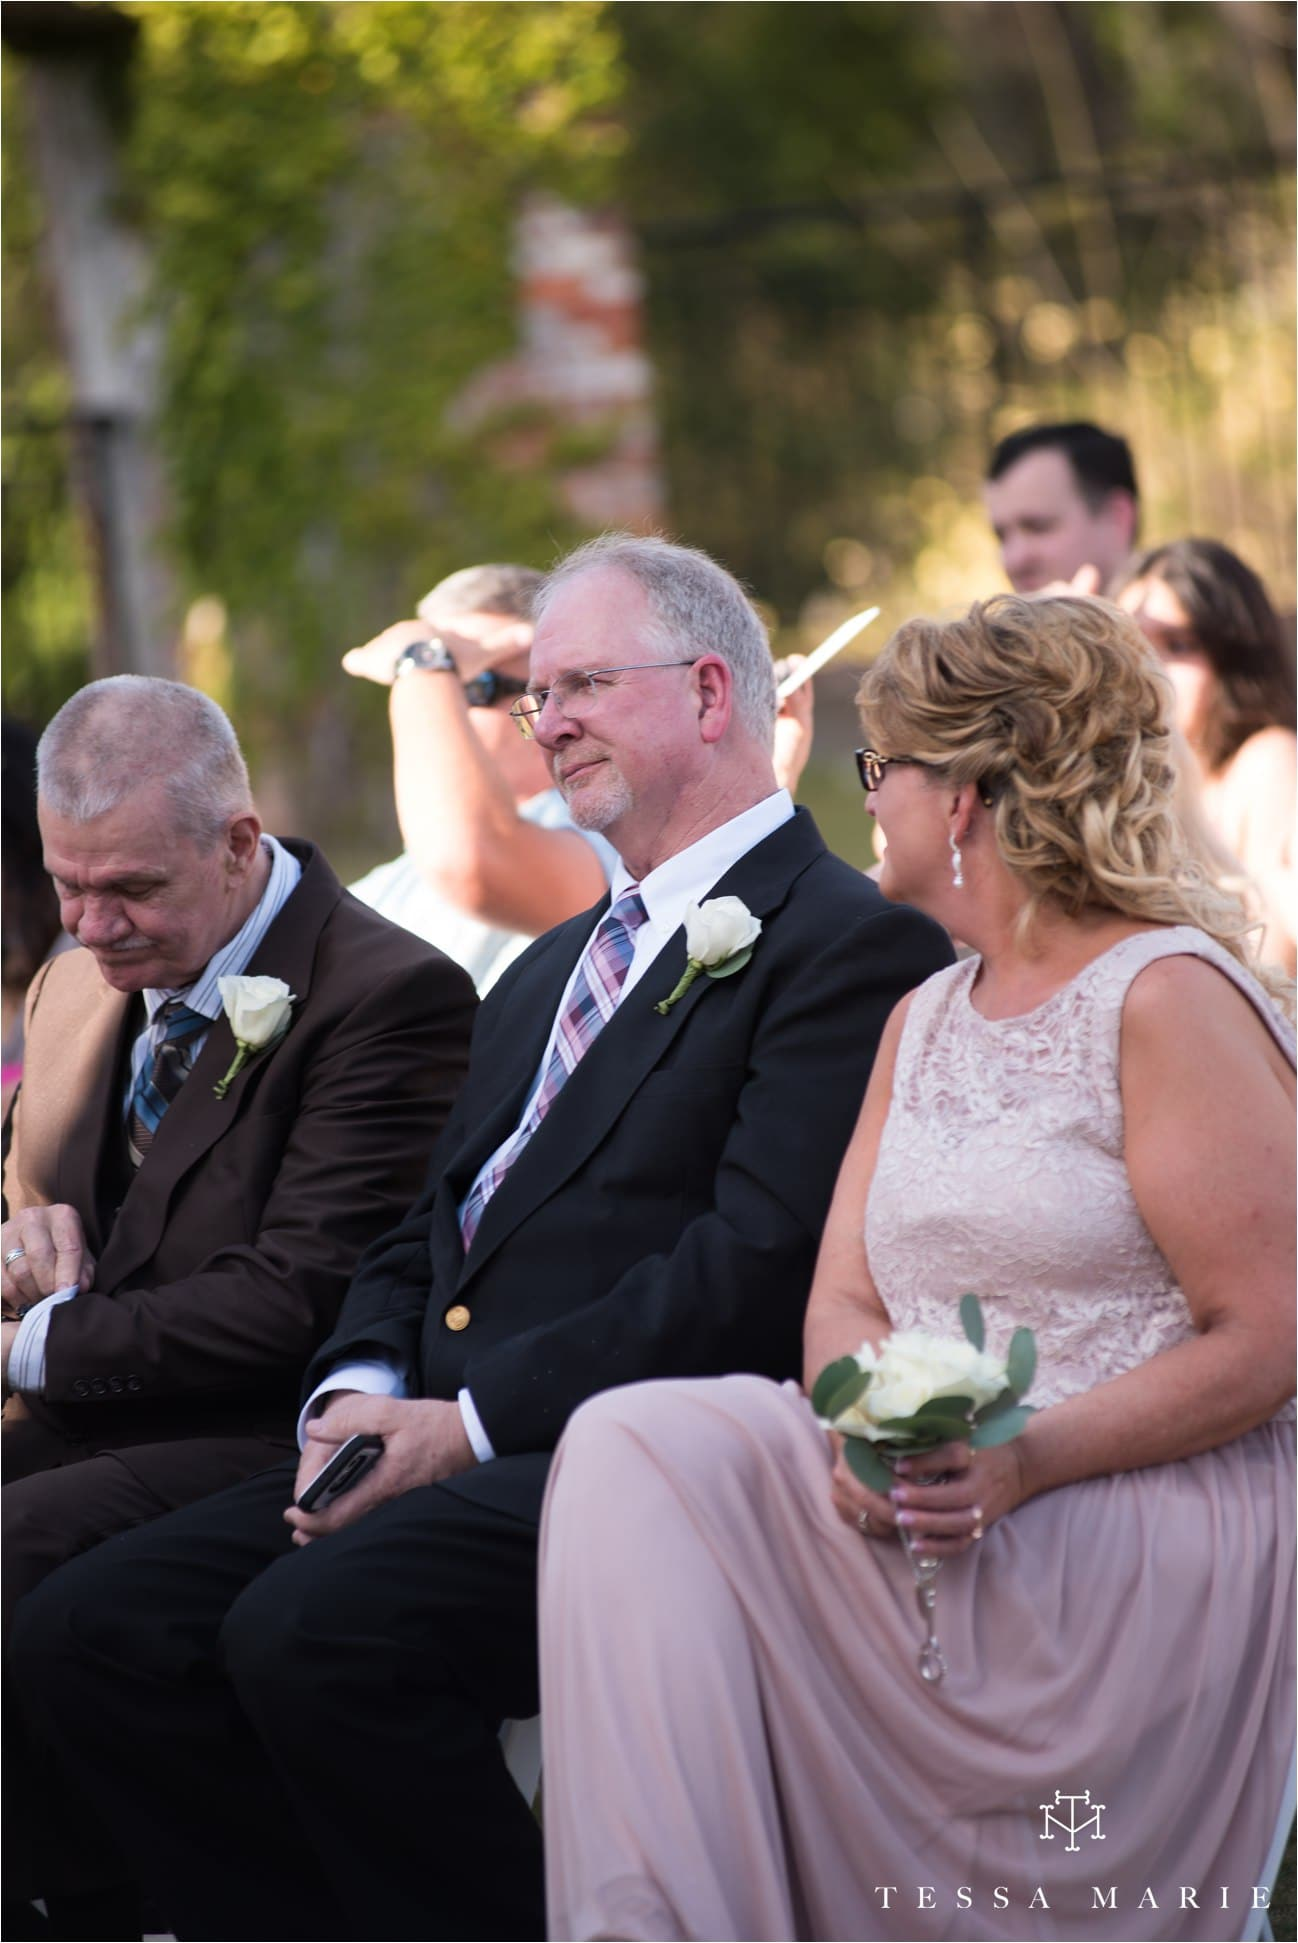 tessa_marie_weddings_rivermill_event_centere_candid_outdoor_wedding_photos_0213